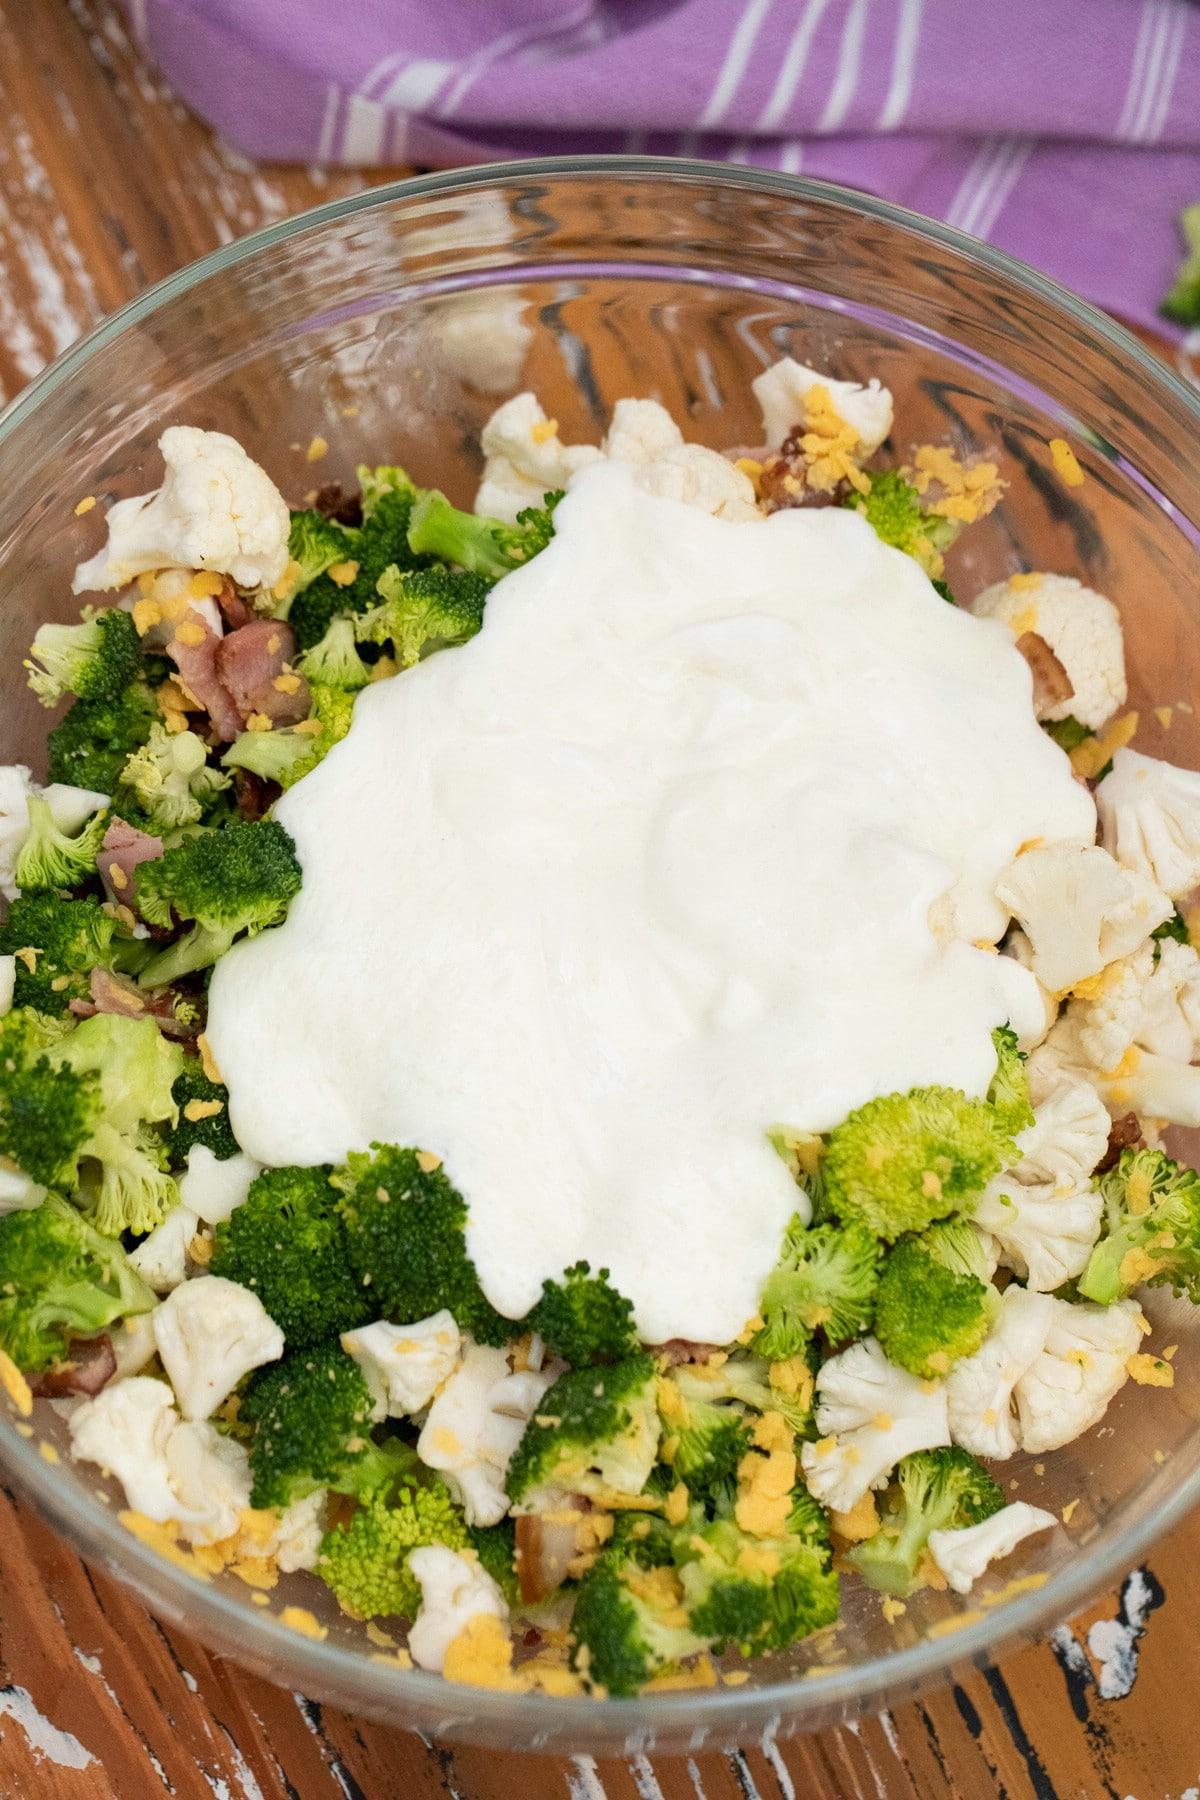 Dressing on top of broccoli cauliflower salad